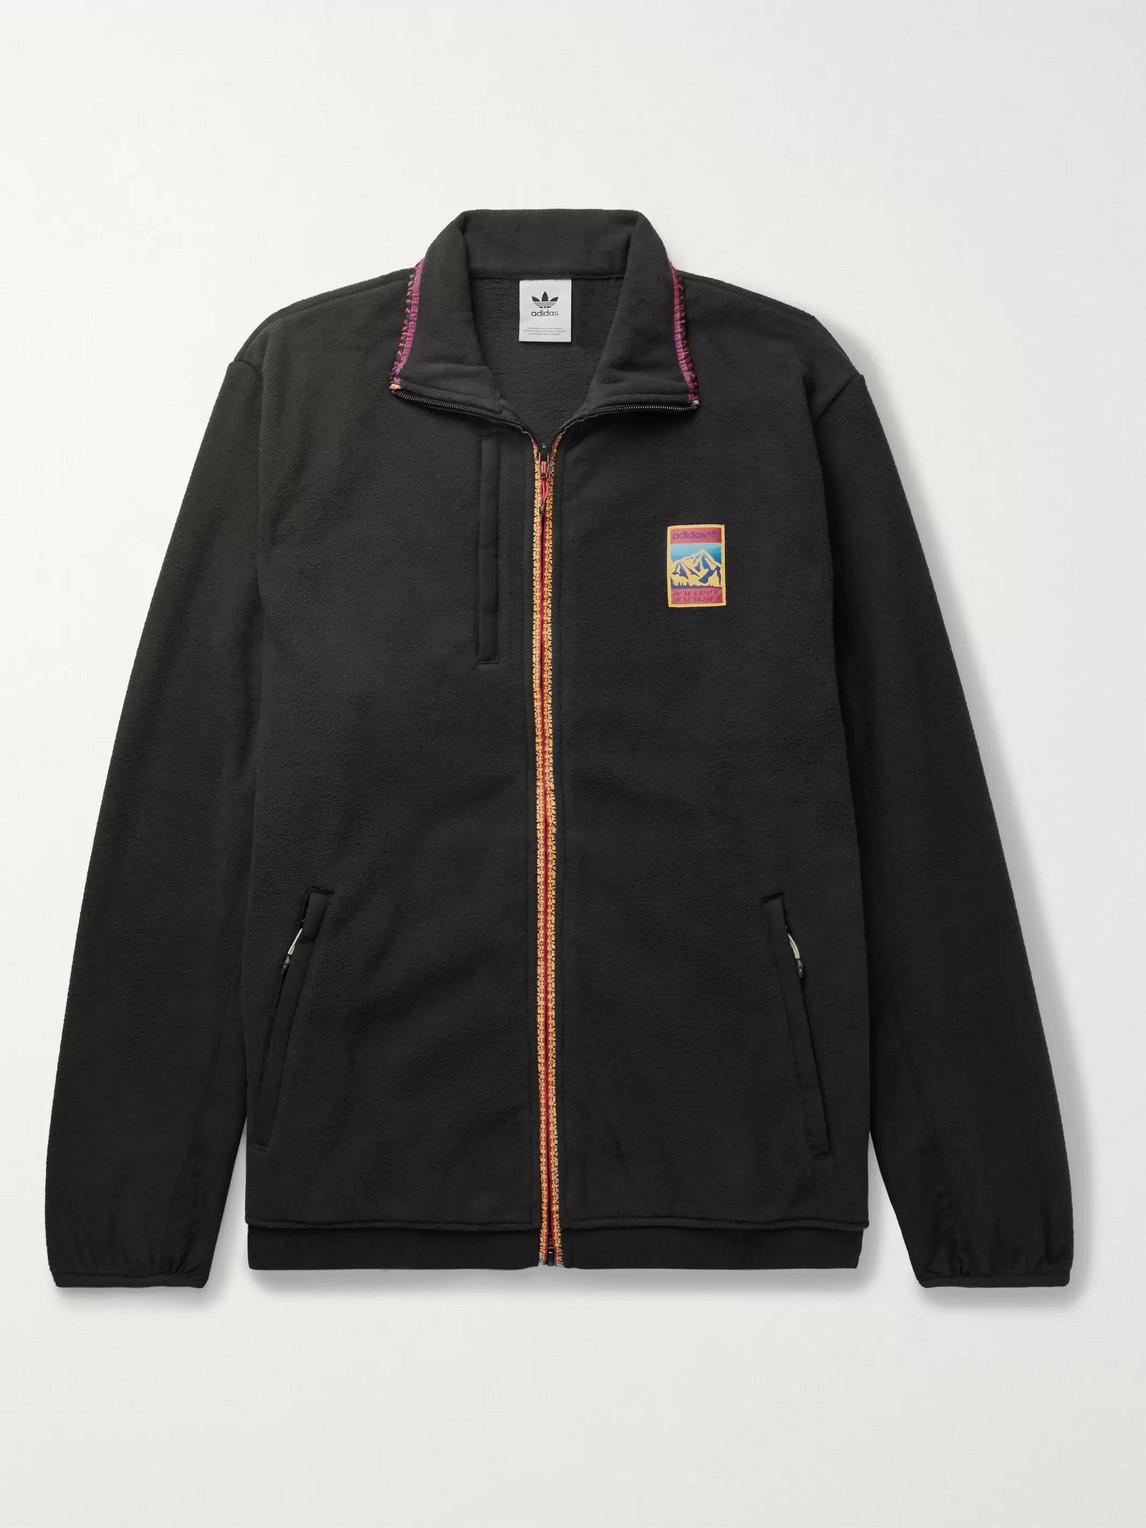 Adidas Originals ADIPLORE LOGO-APPLIQUÉD SHELL-TRIMMED FLEECE JACKET